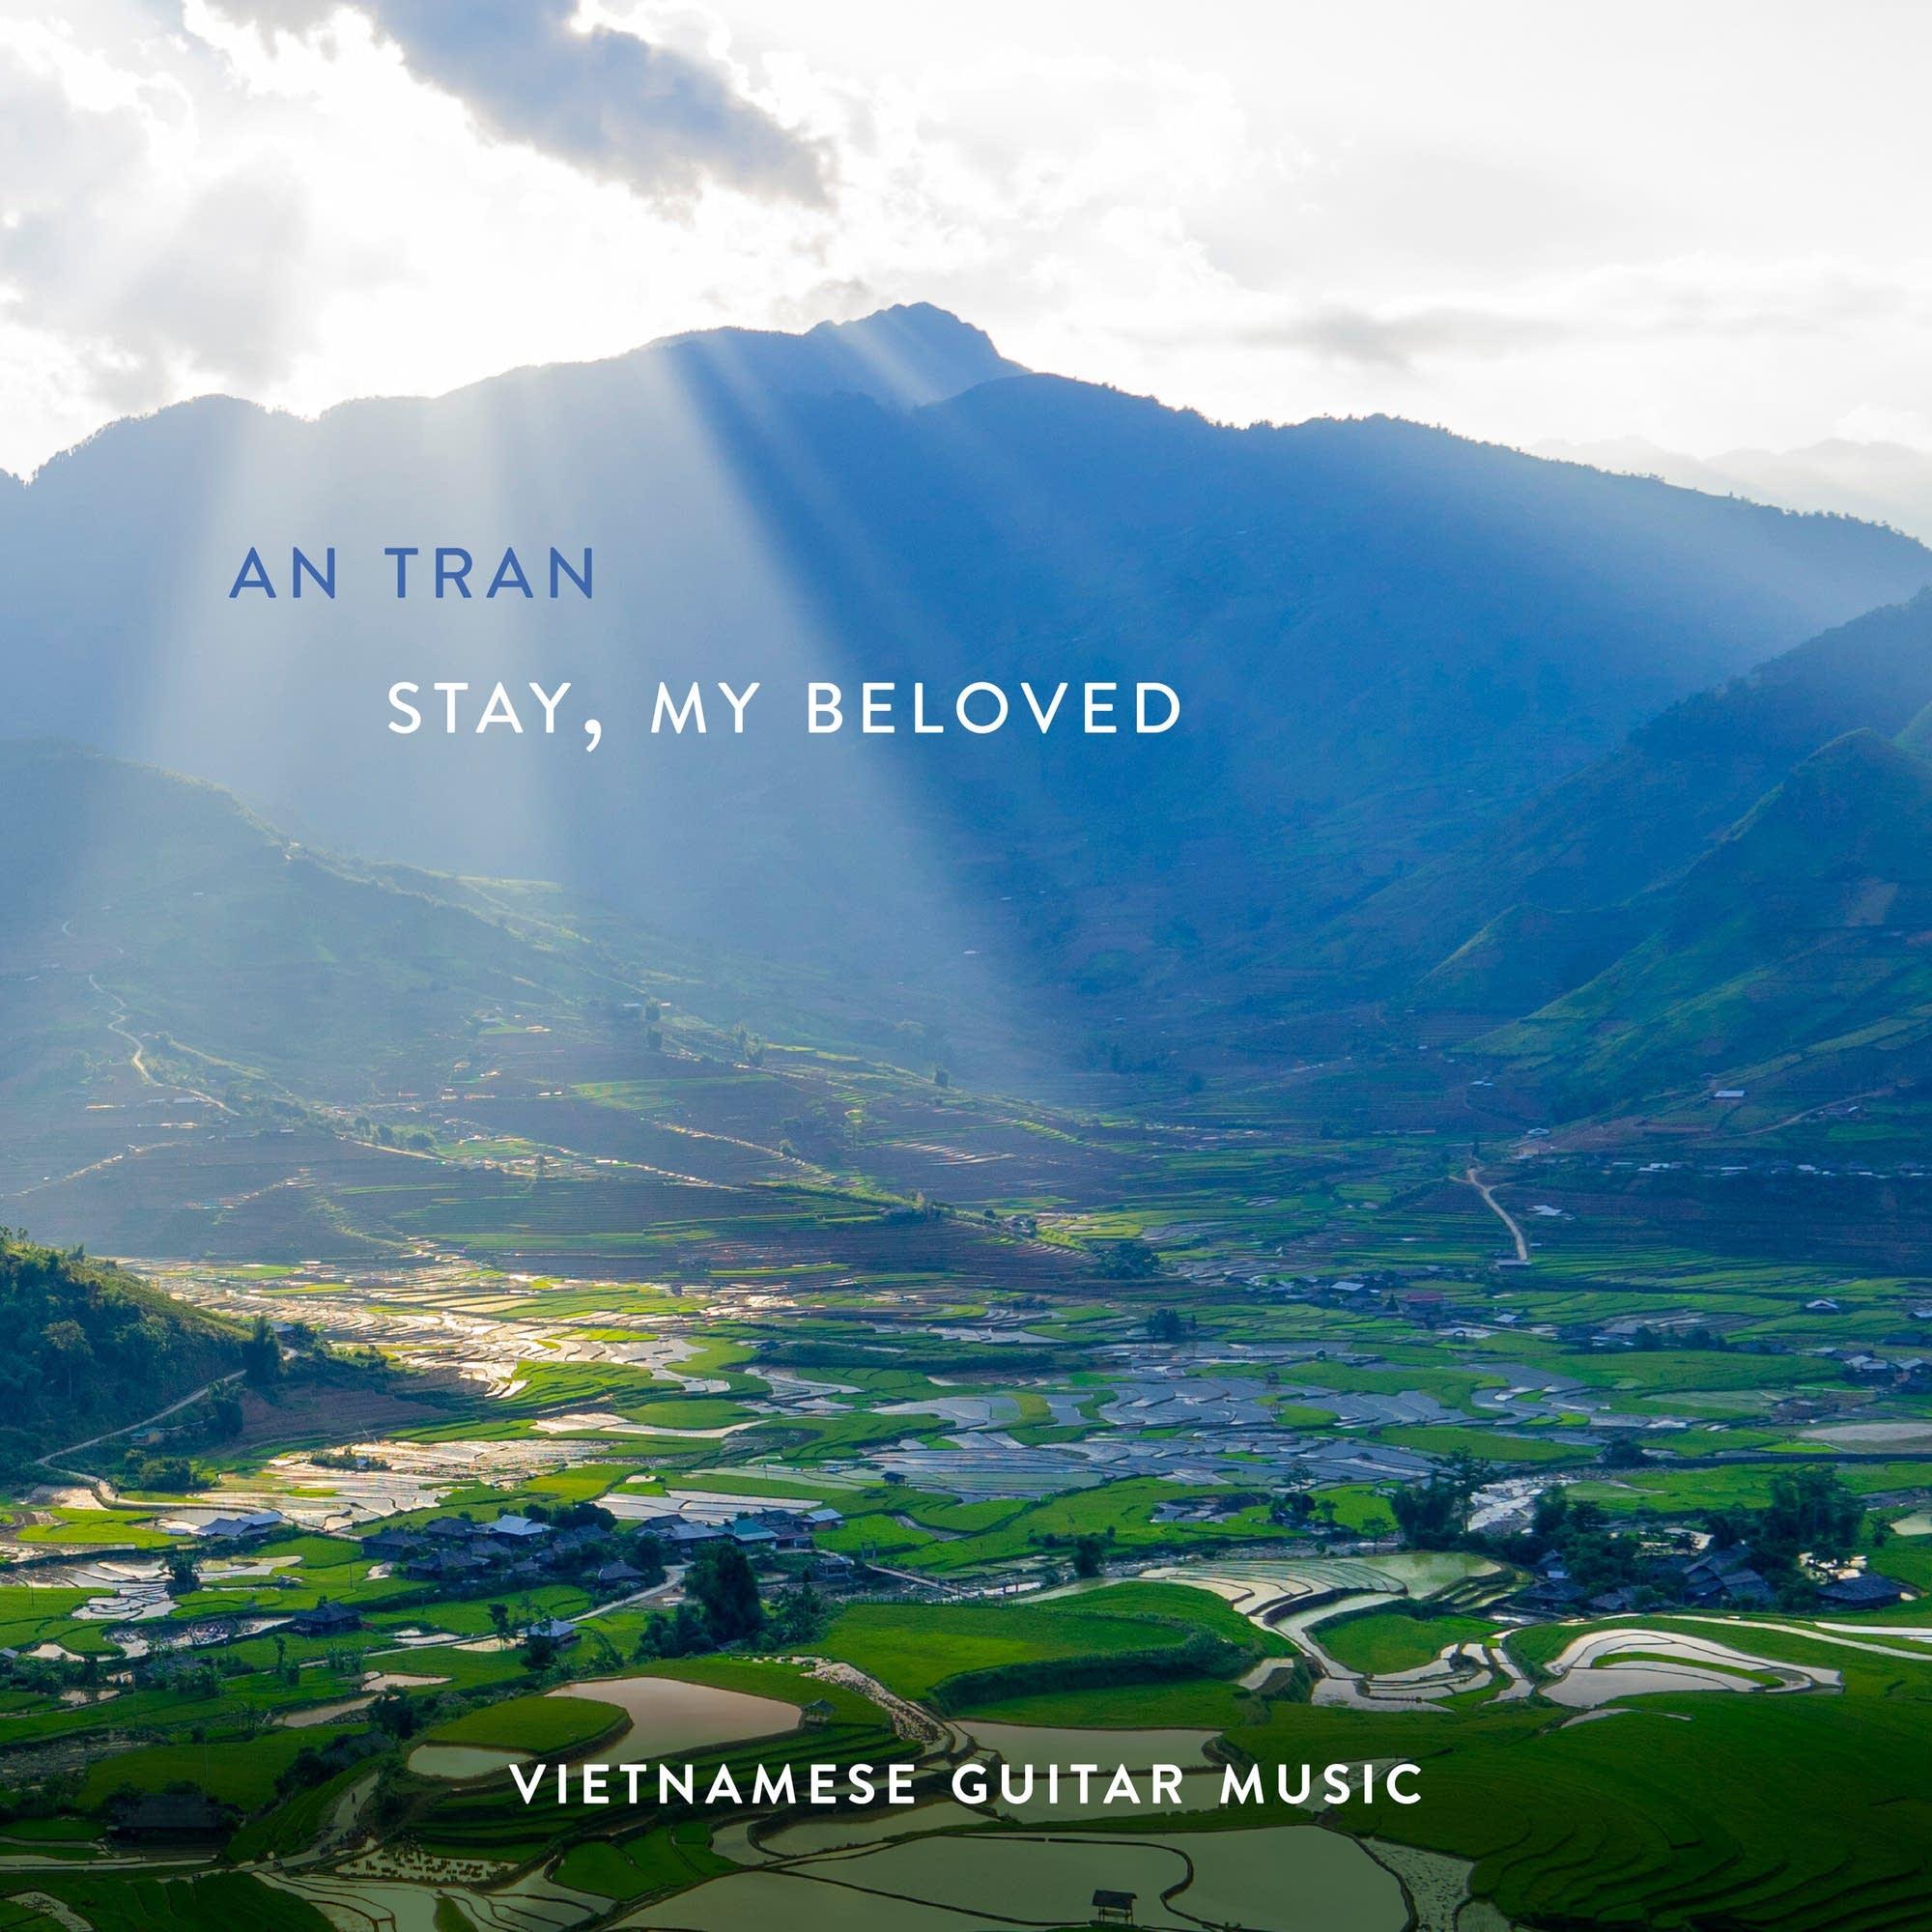 An Tran: Stay, My Beloved